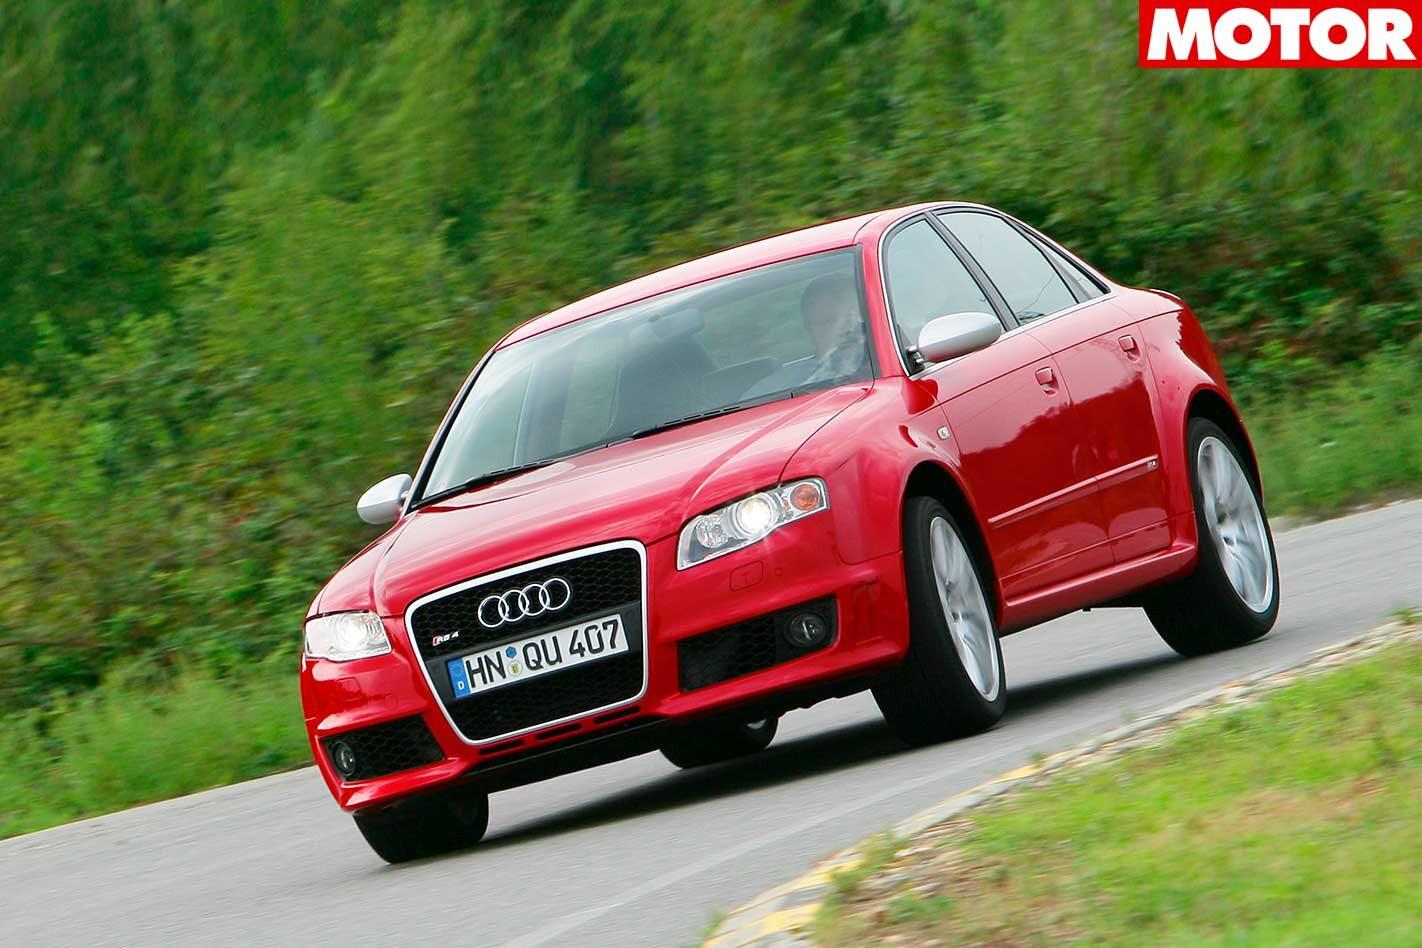 2006 Audi RS4 review classic MOTOR